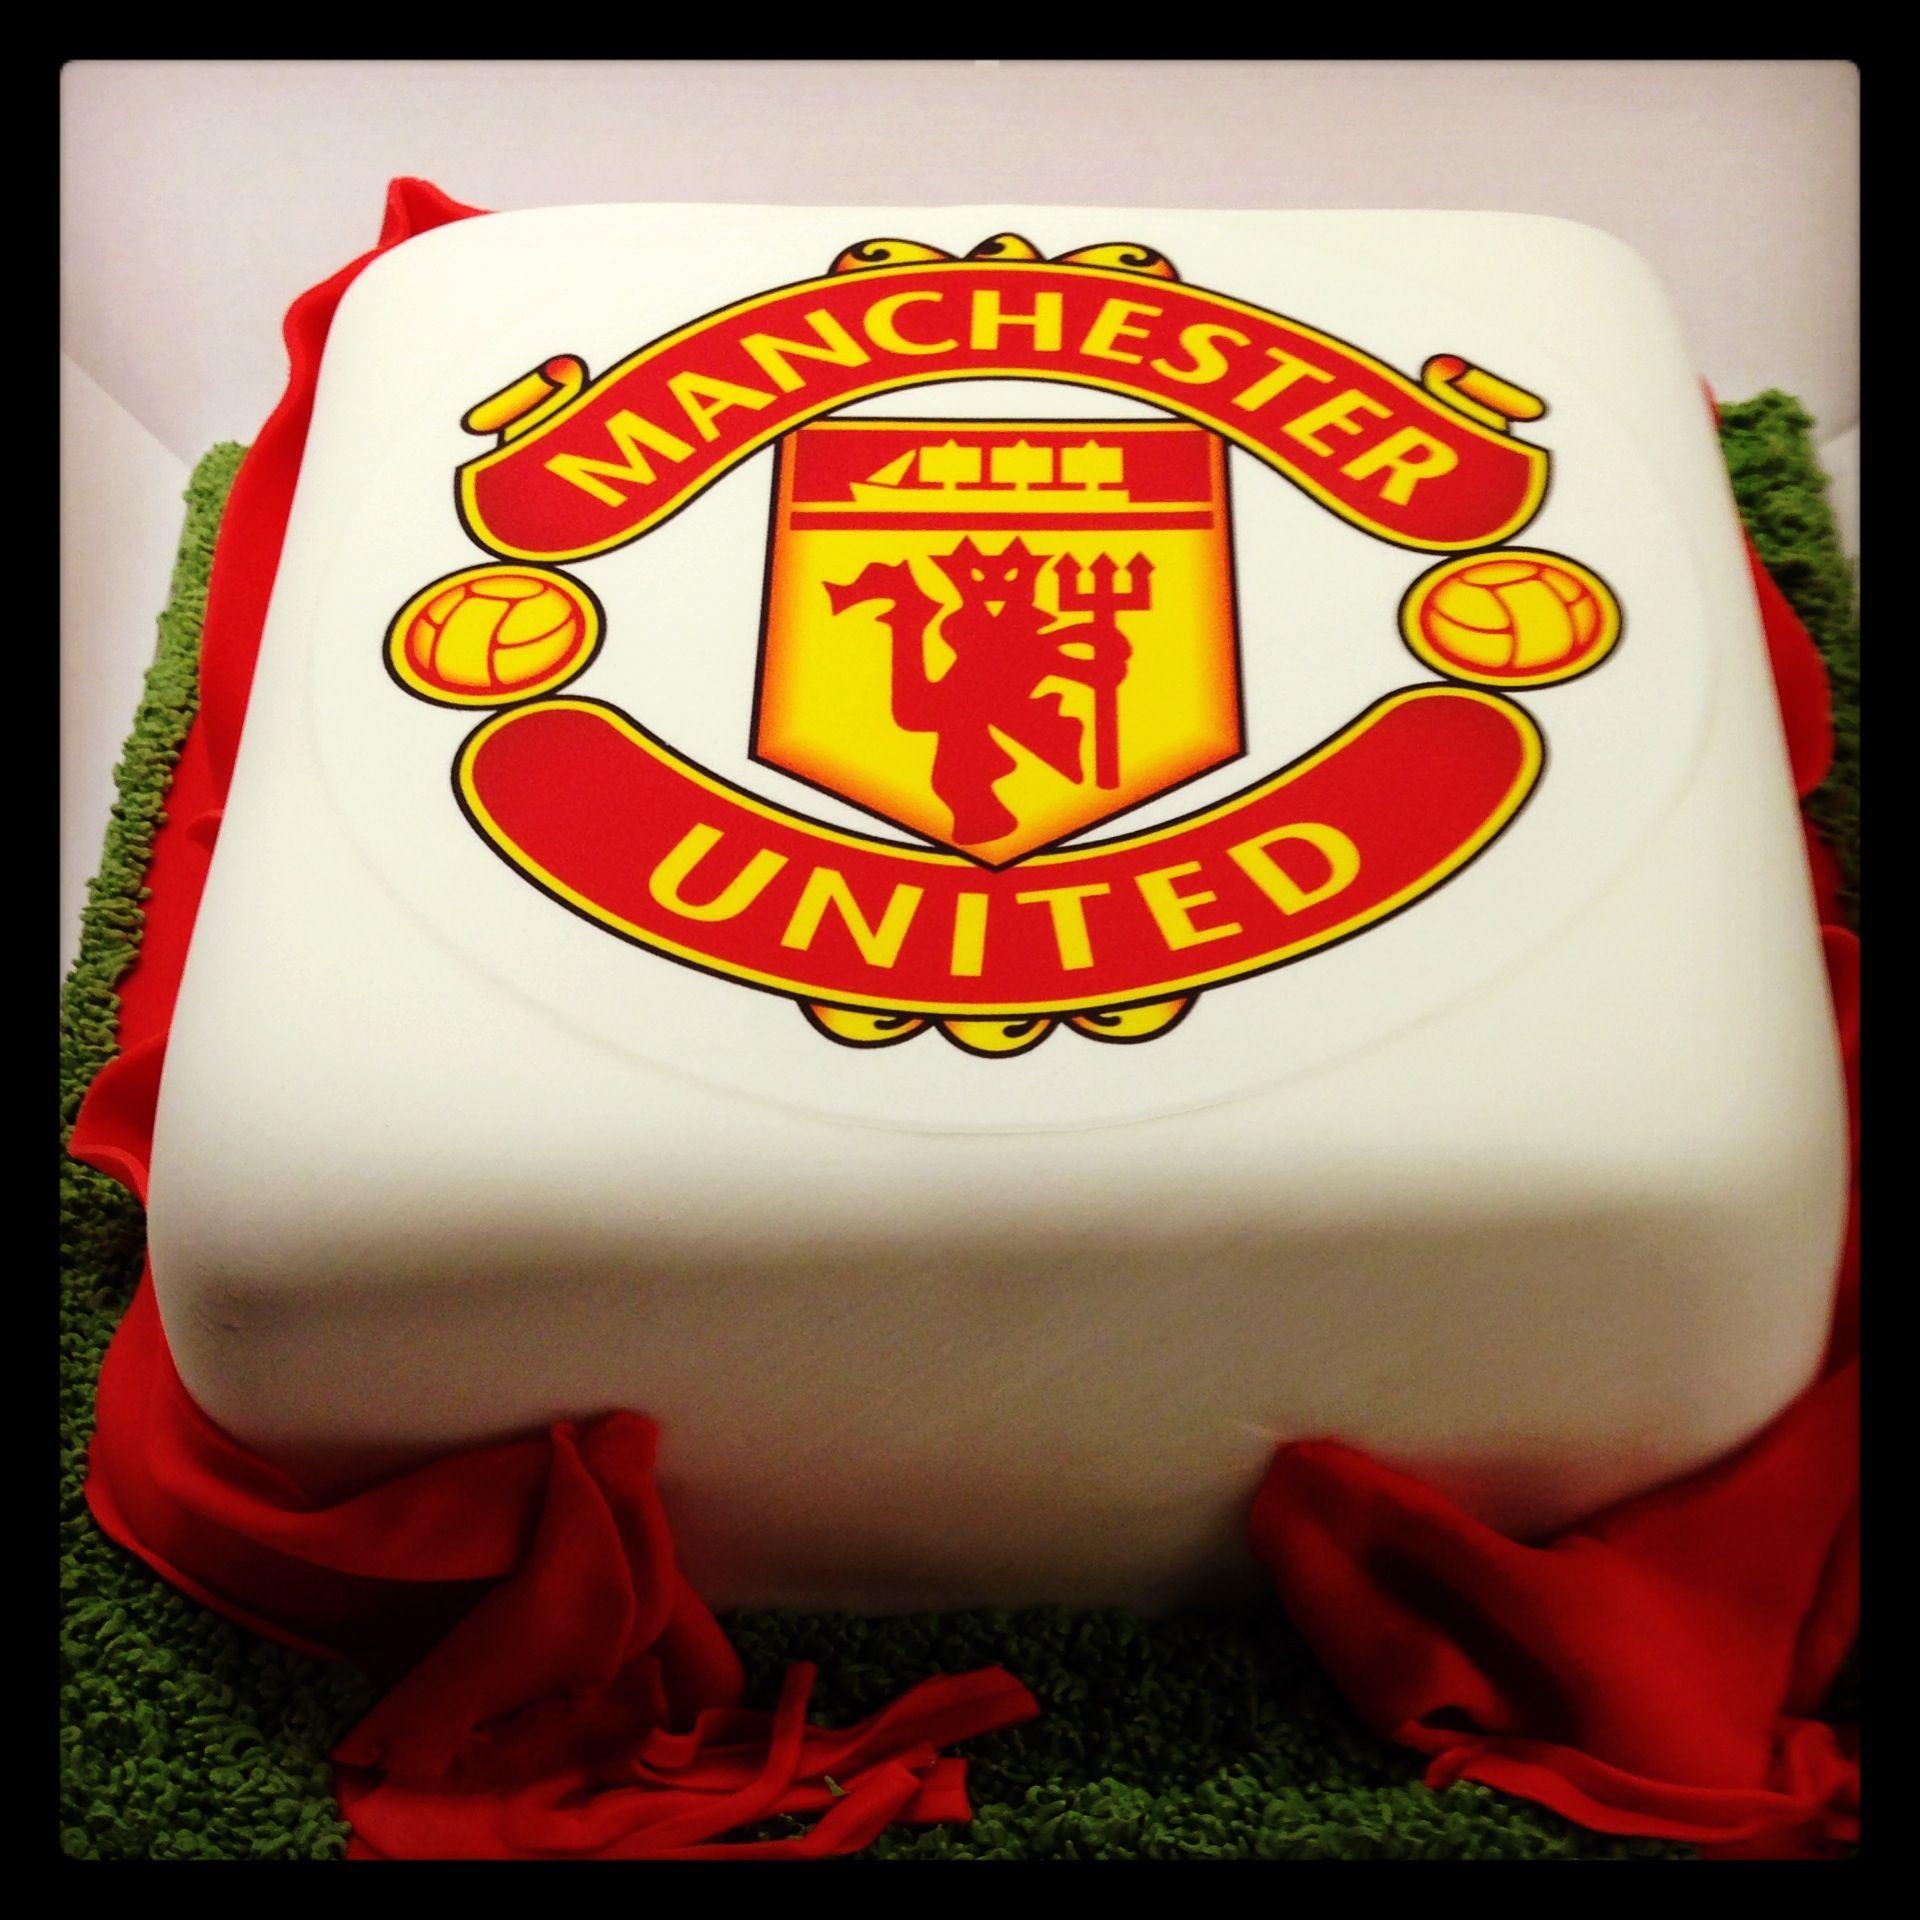 Manchester United Cake Poke Theaapuspita Manchester United Birthday Cake Manchester United Cake Simple Fondant Cake